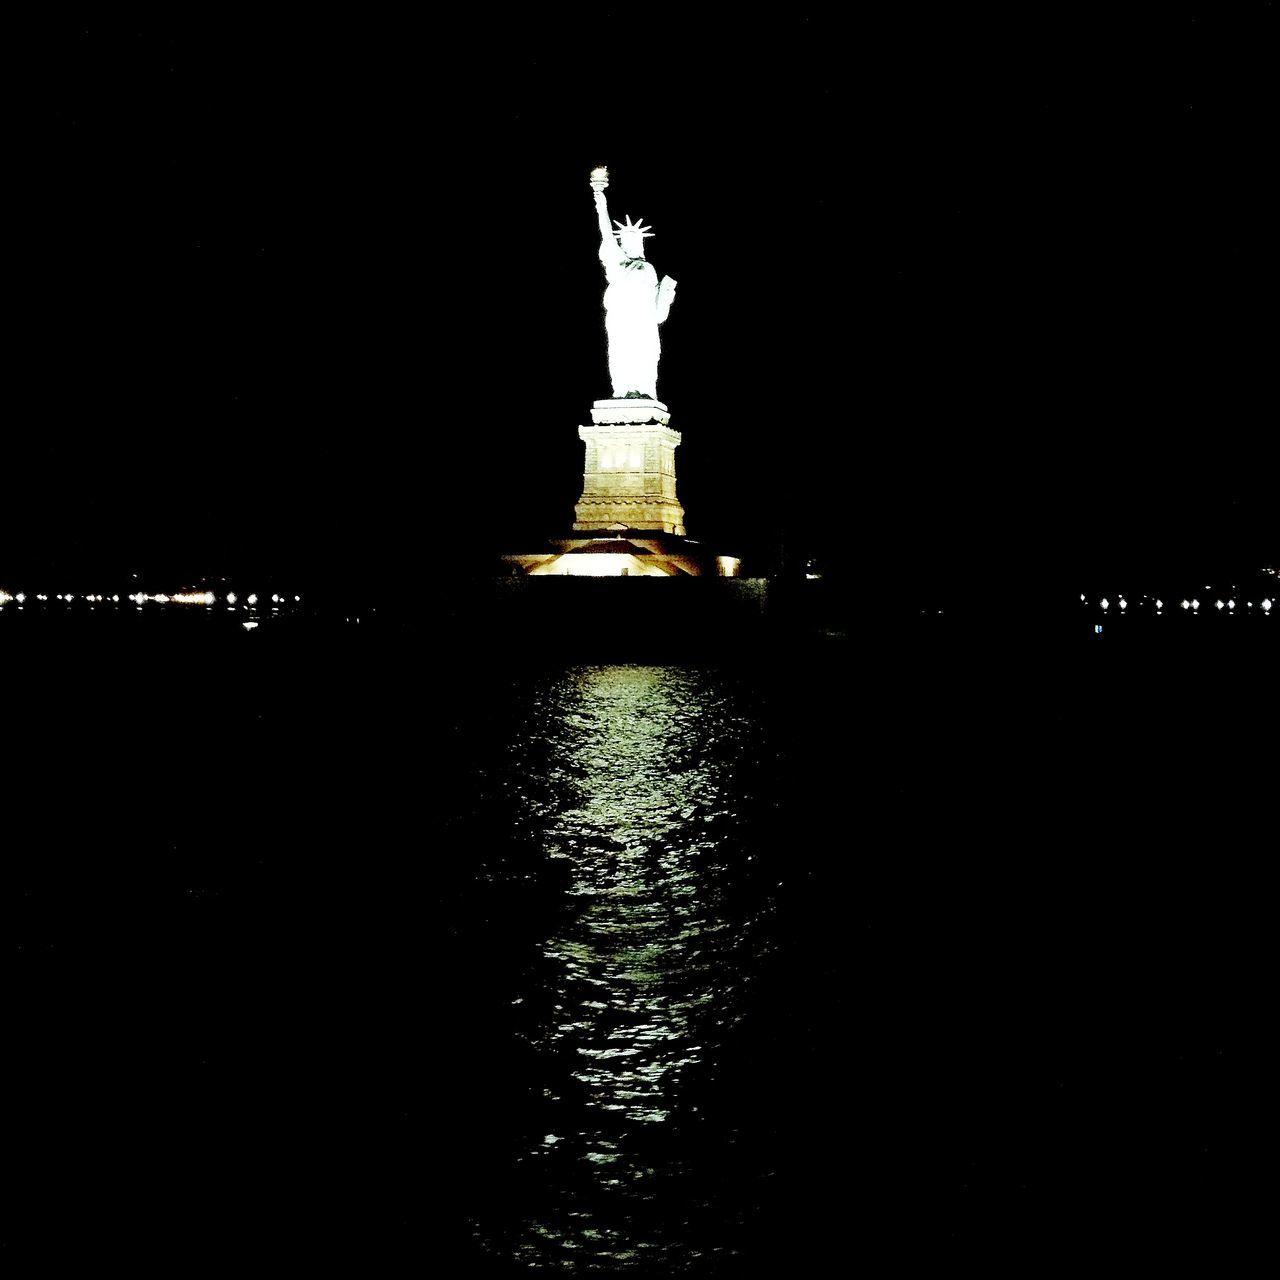 statue, night, water, human representation, female likeness, sculpture, illuminated, no people, travel destinations, outdoors, travel, architecture, sky